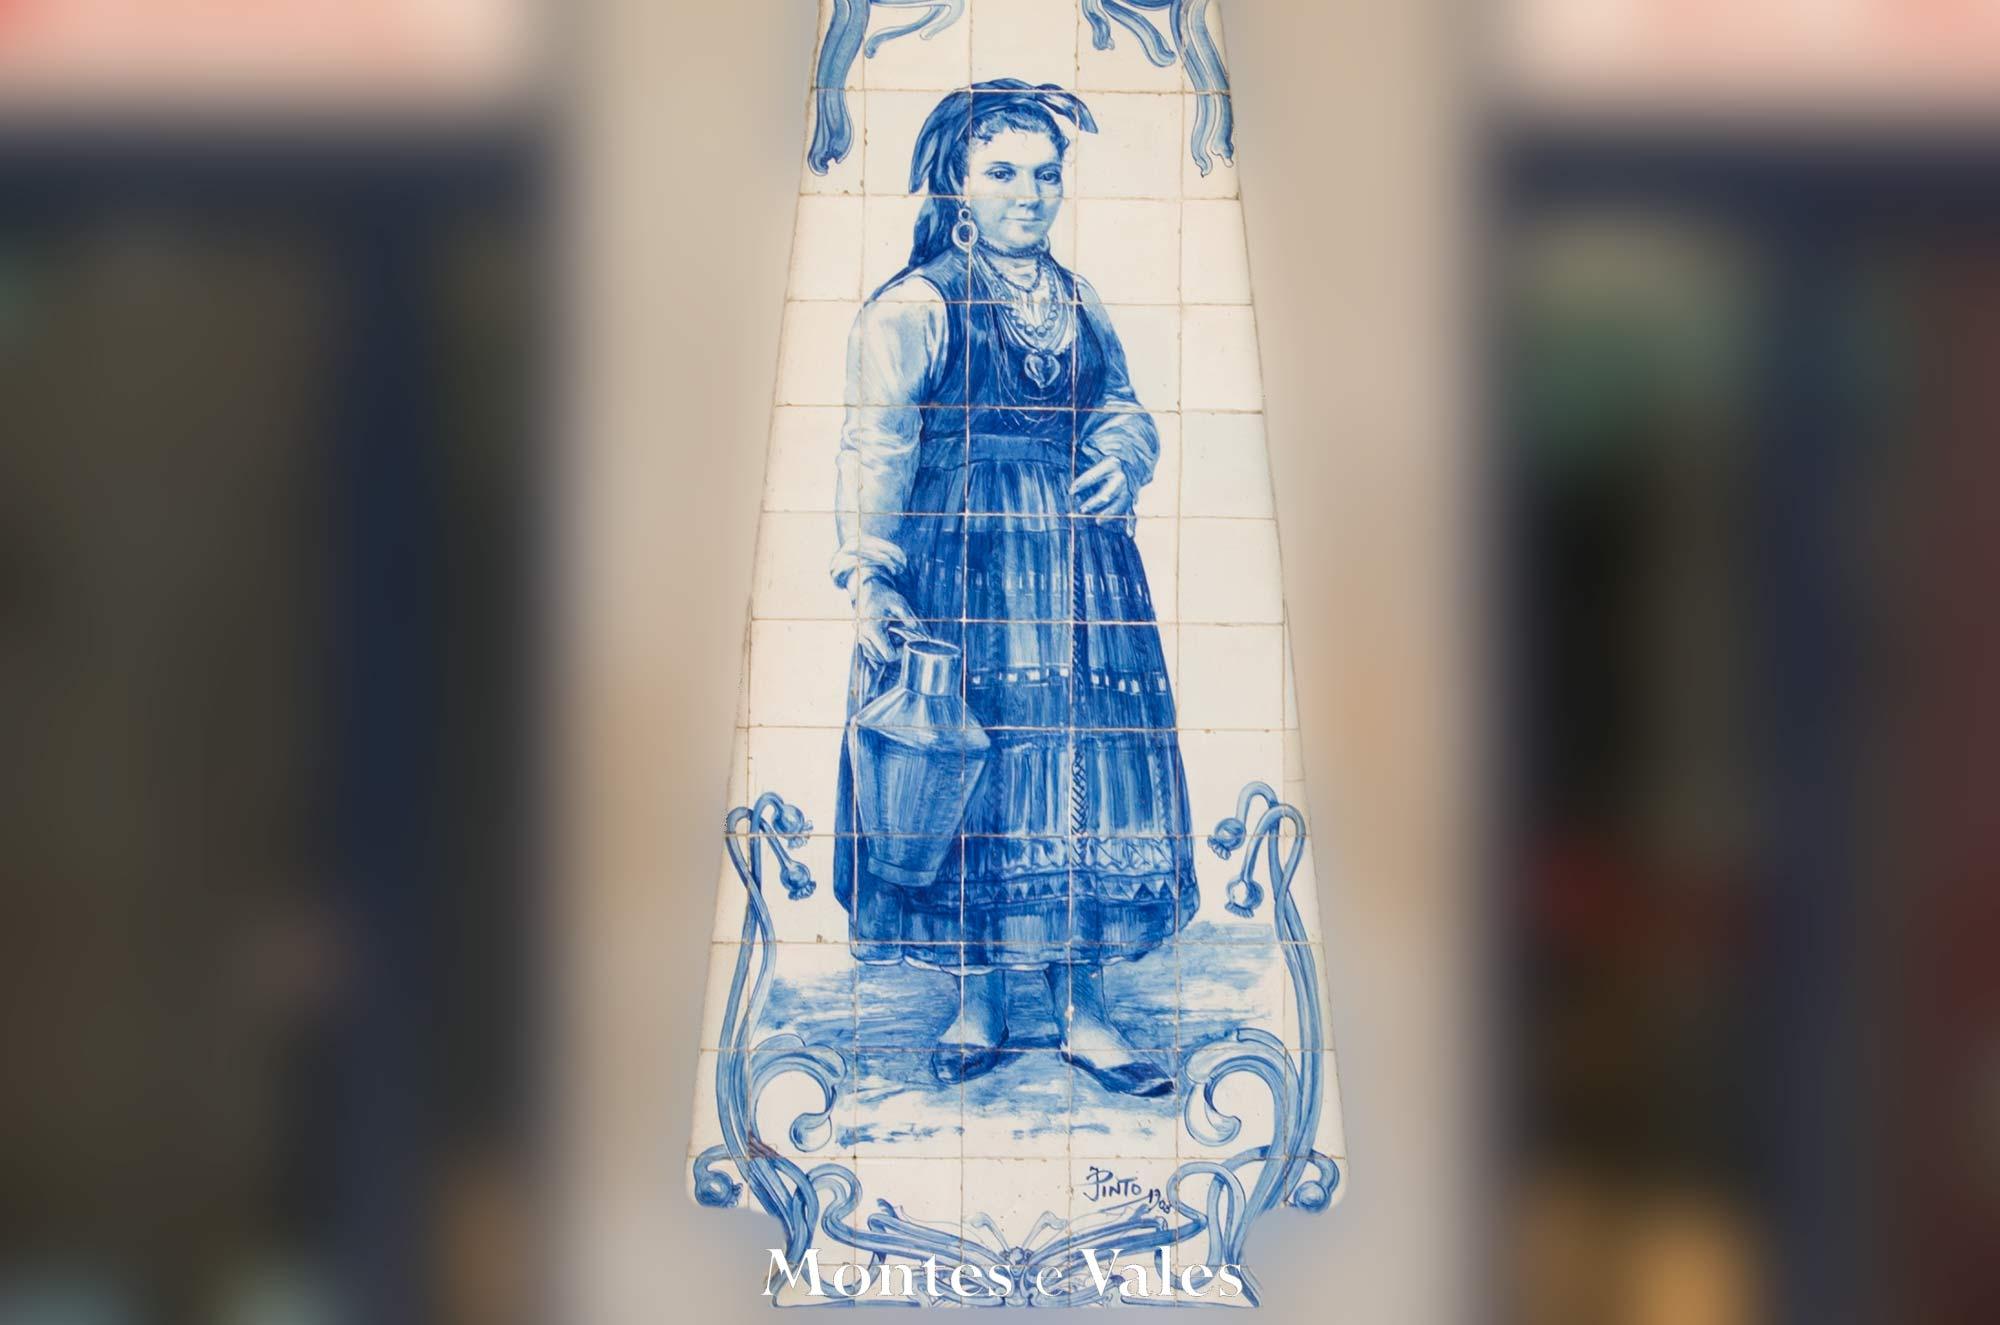 Onde se encontra este magnífico painel de azulejos?